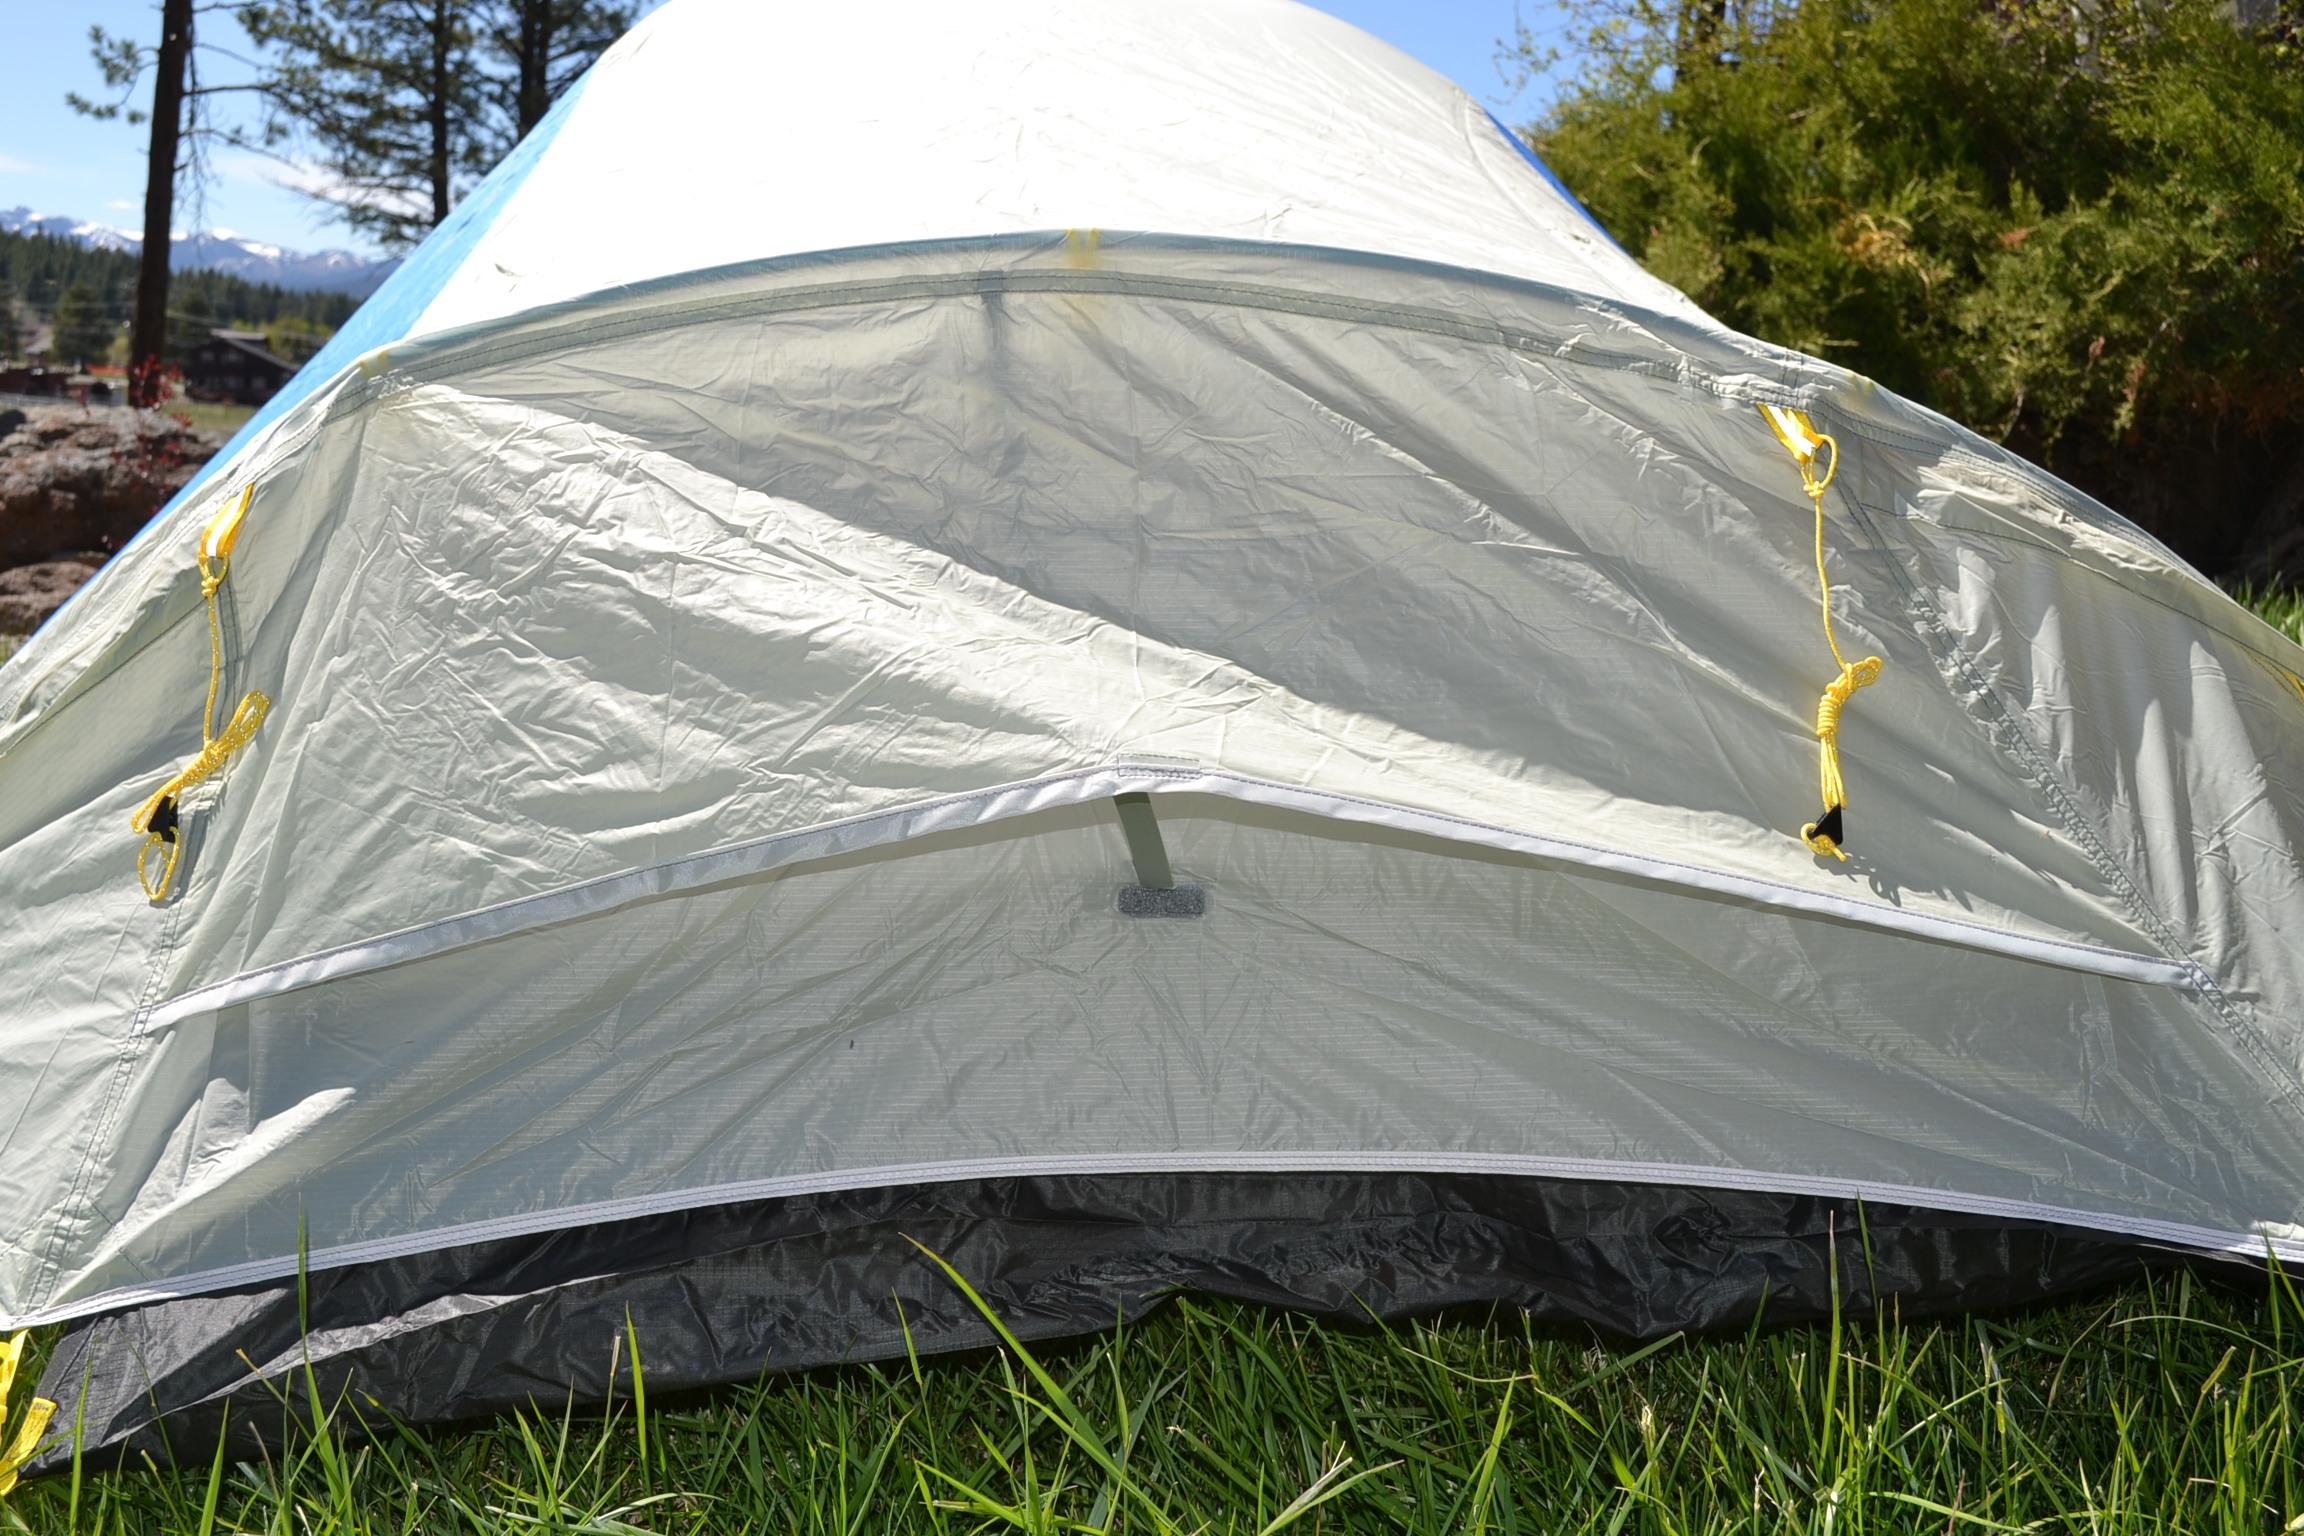 Sierra Designs High Side 2 Tent - foot vent